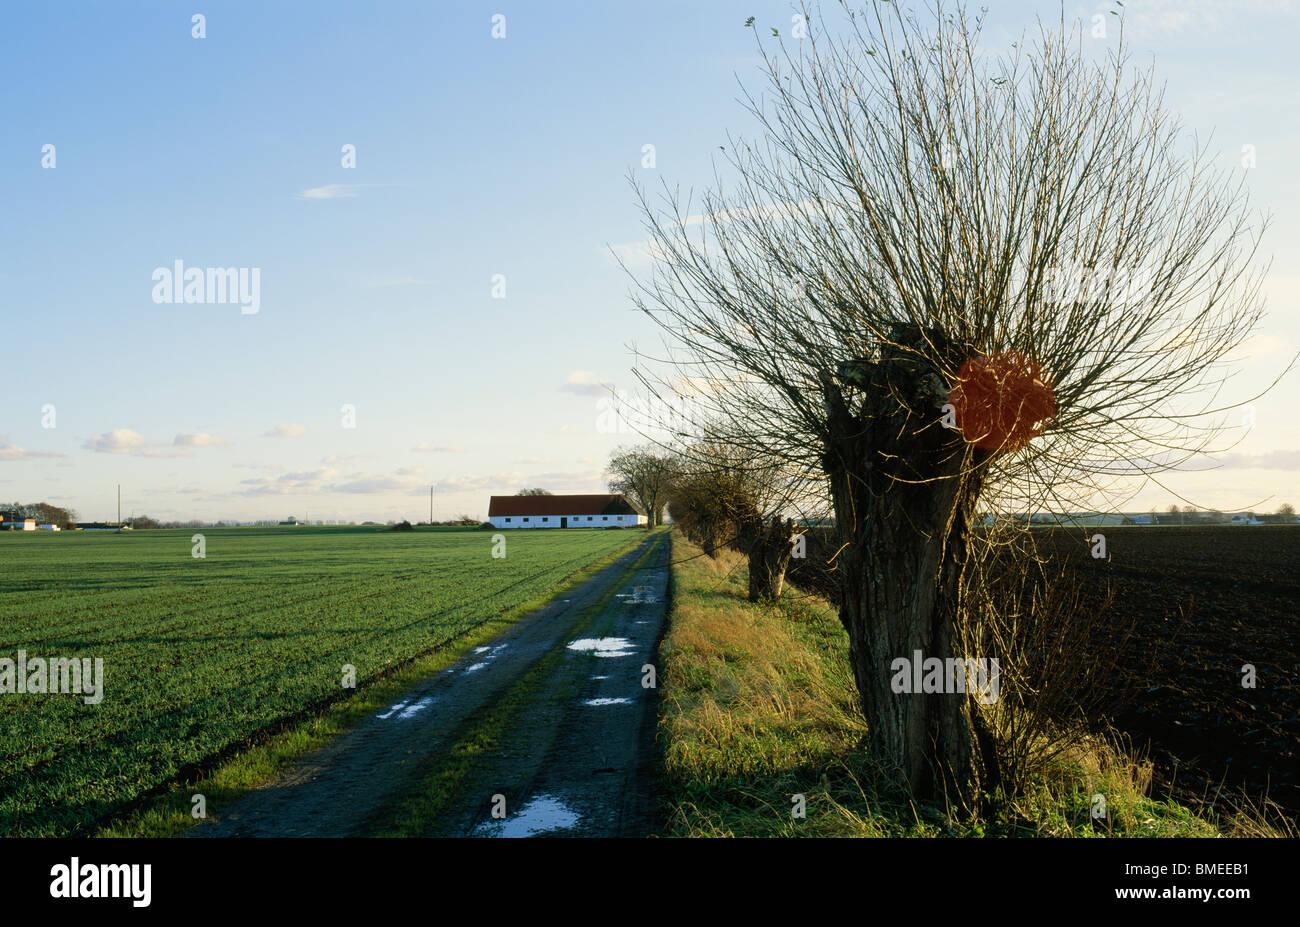 Road passing through landscape - Stock Image